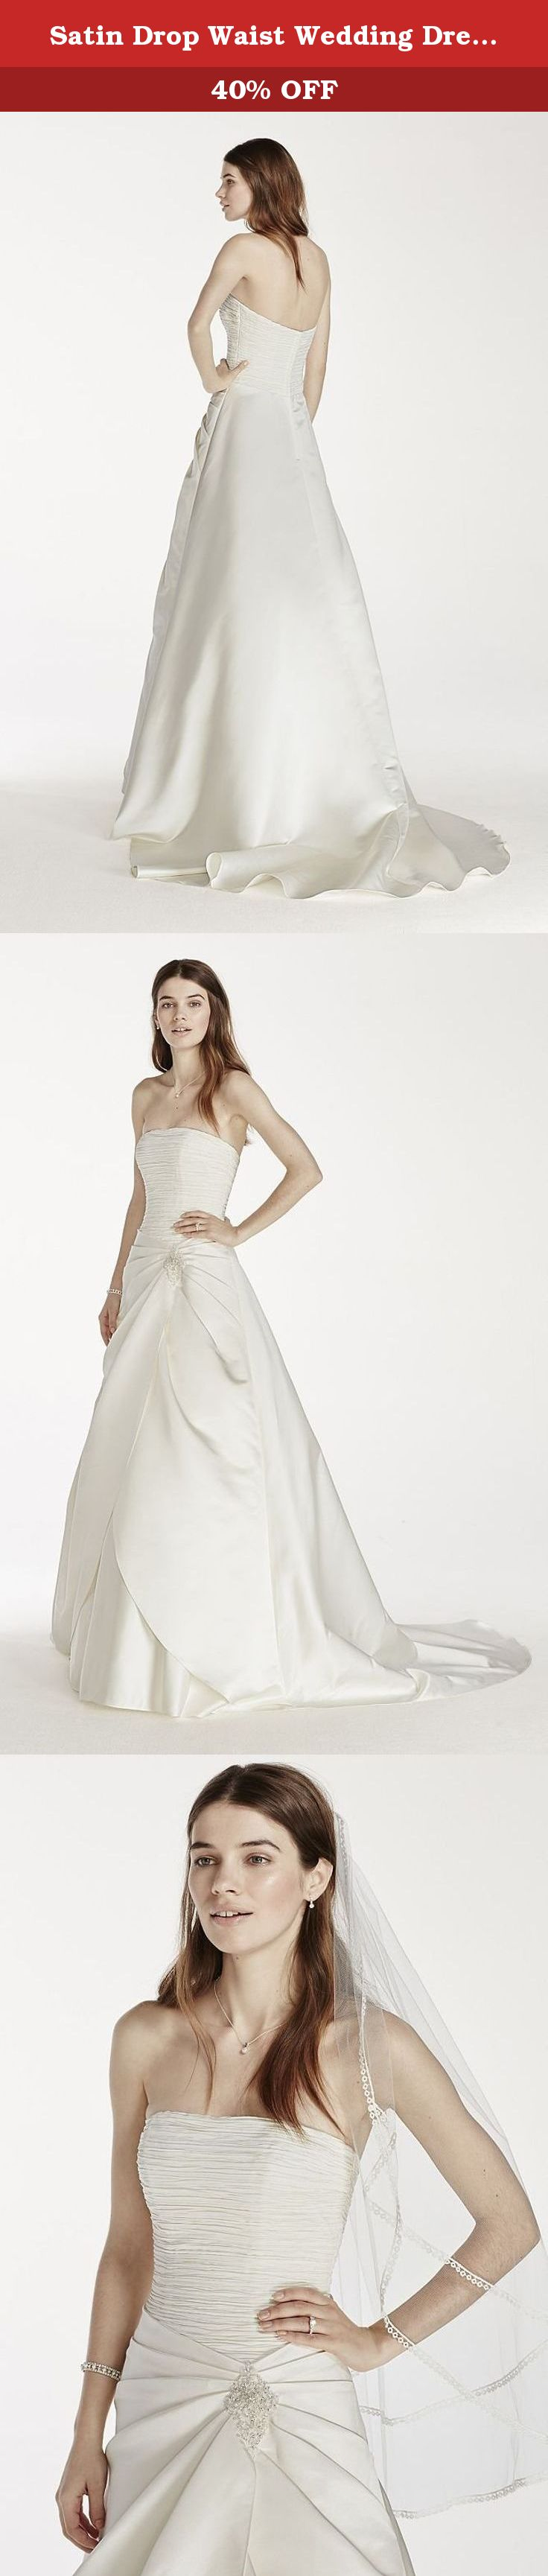 Satin drop waist wedding dress with side split style op ivory